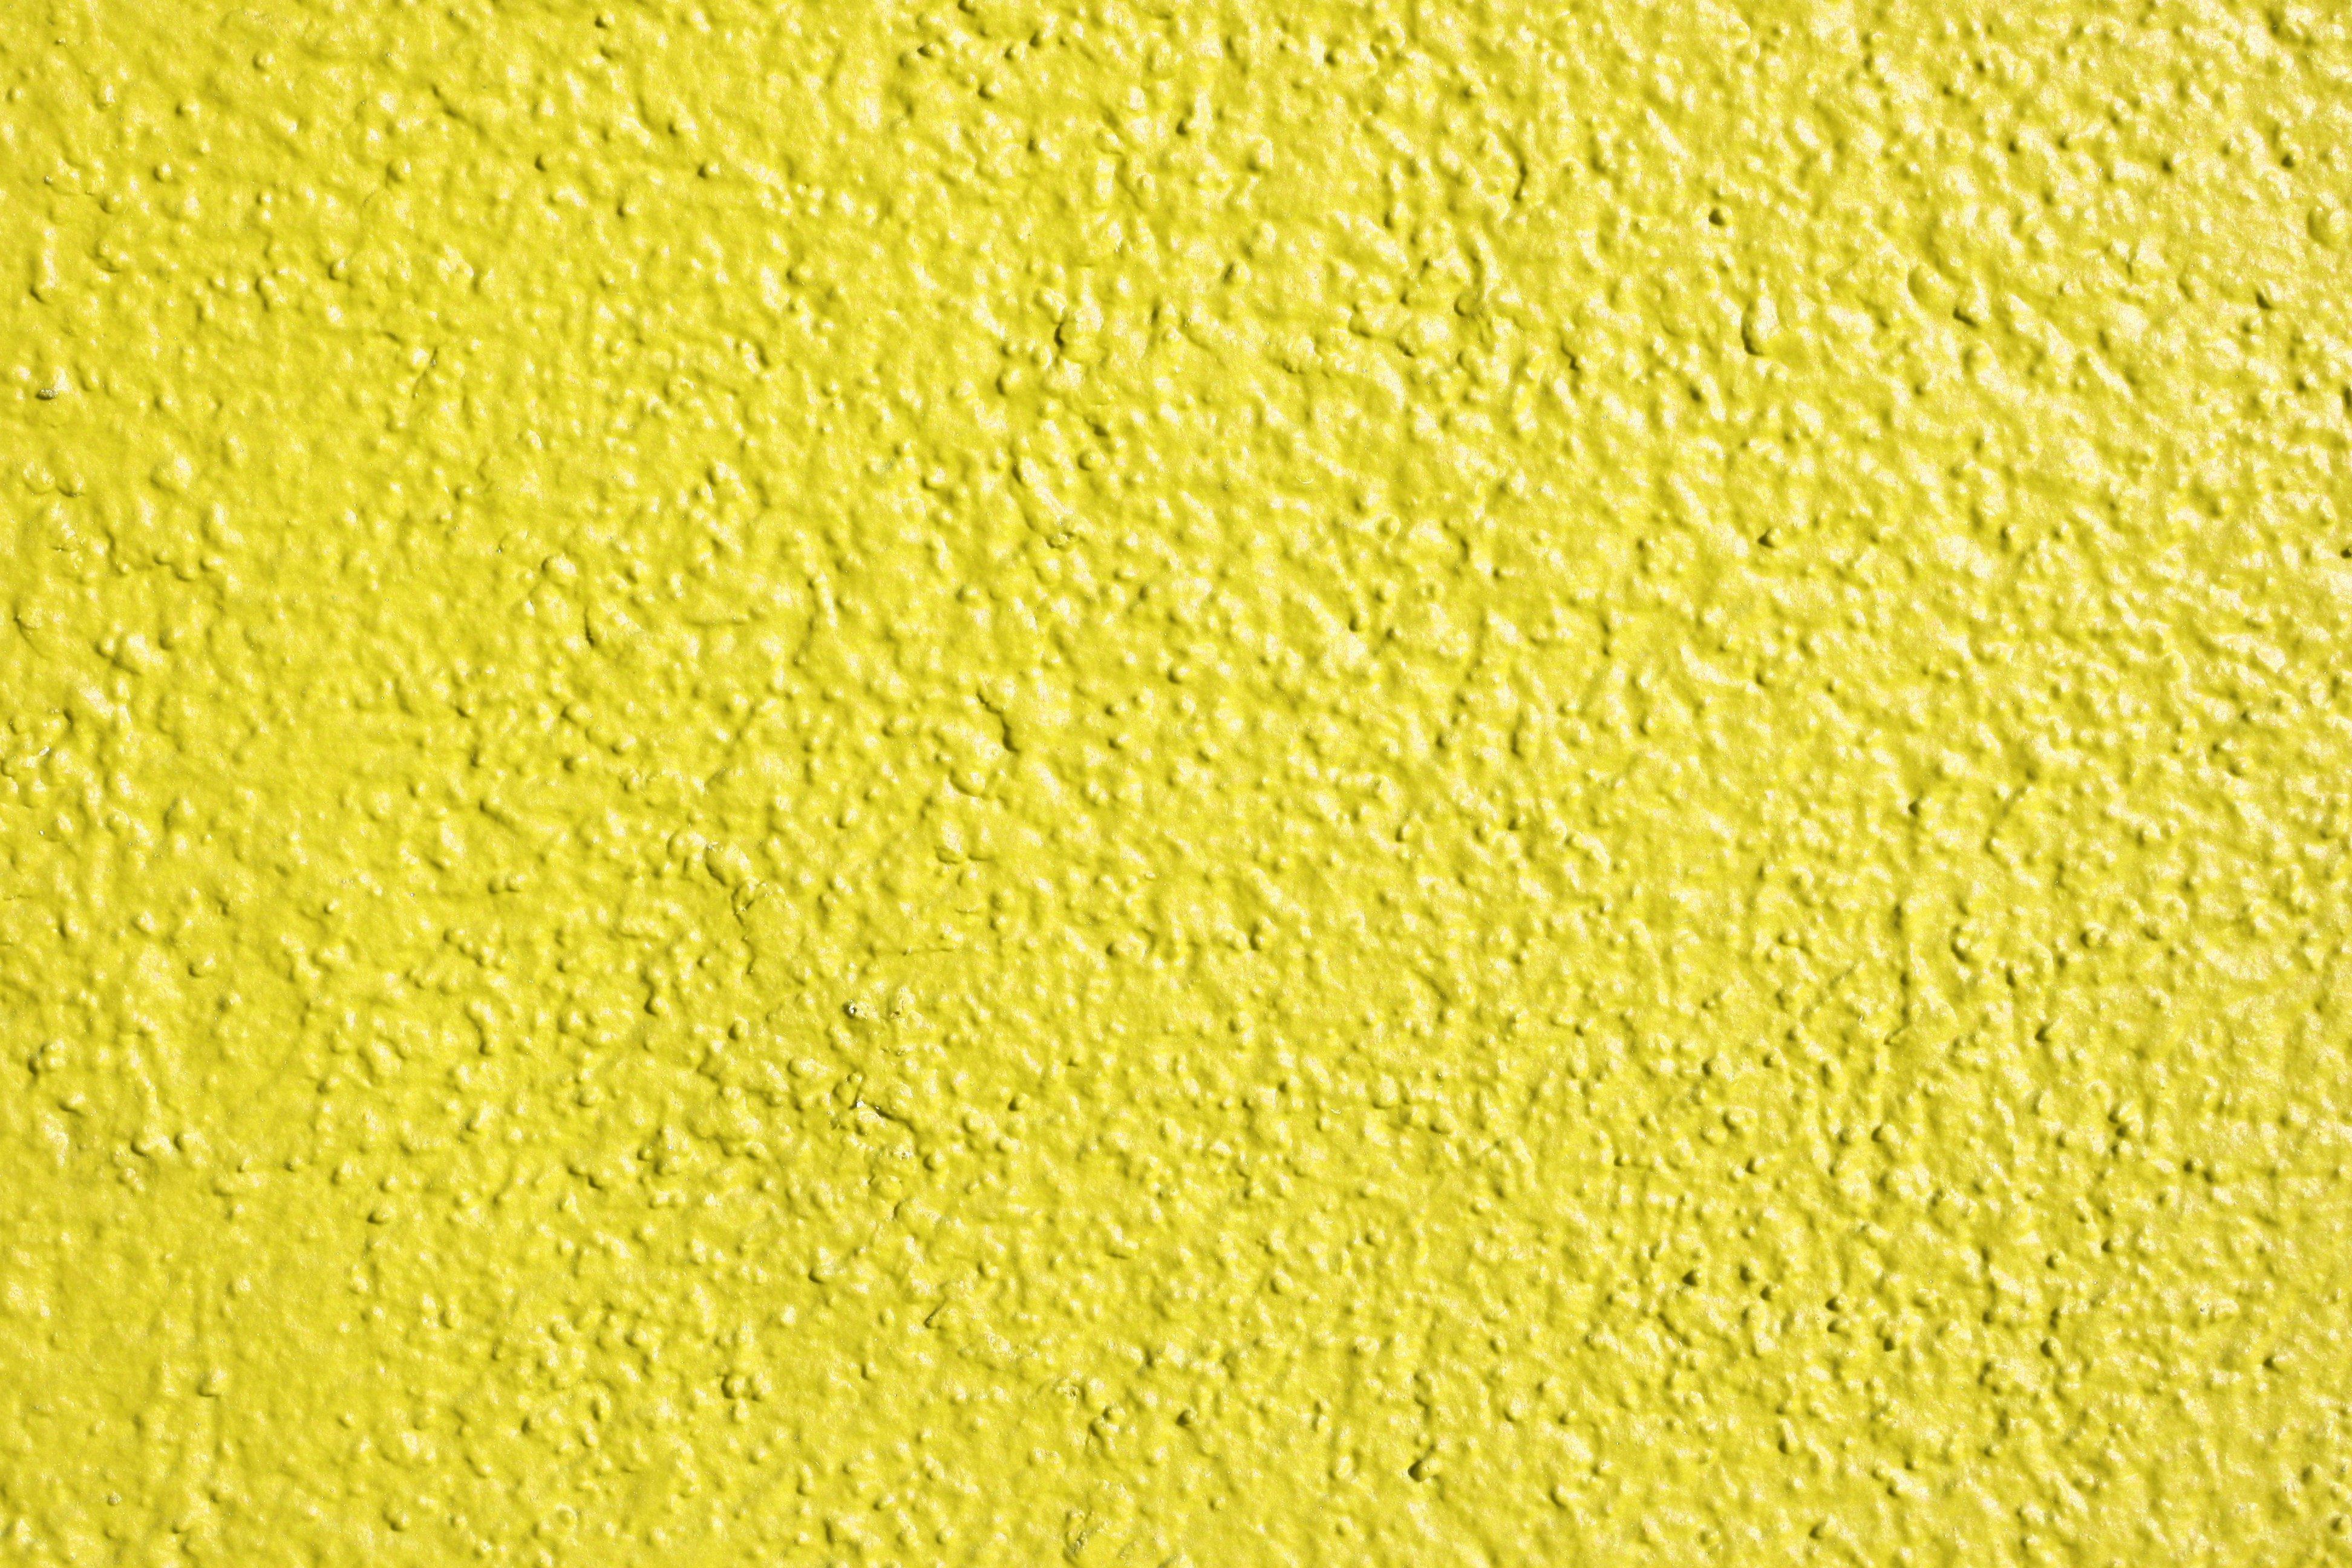 Yellow Wall Texture 1600 X 1067 204 Kb Jpeg Yellow Walls Living Room  3888x2592